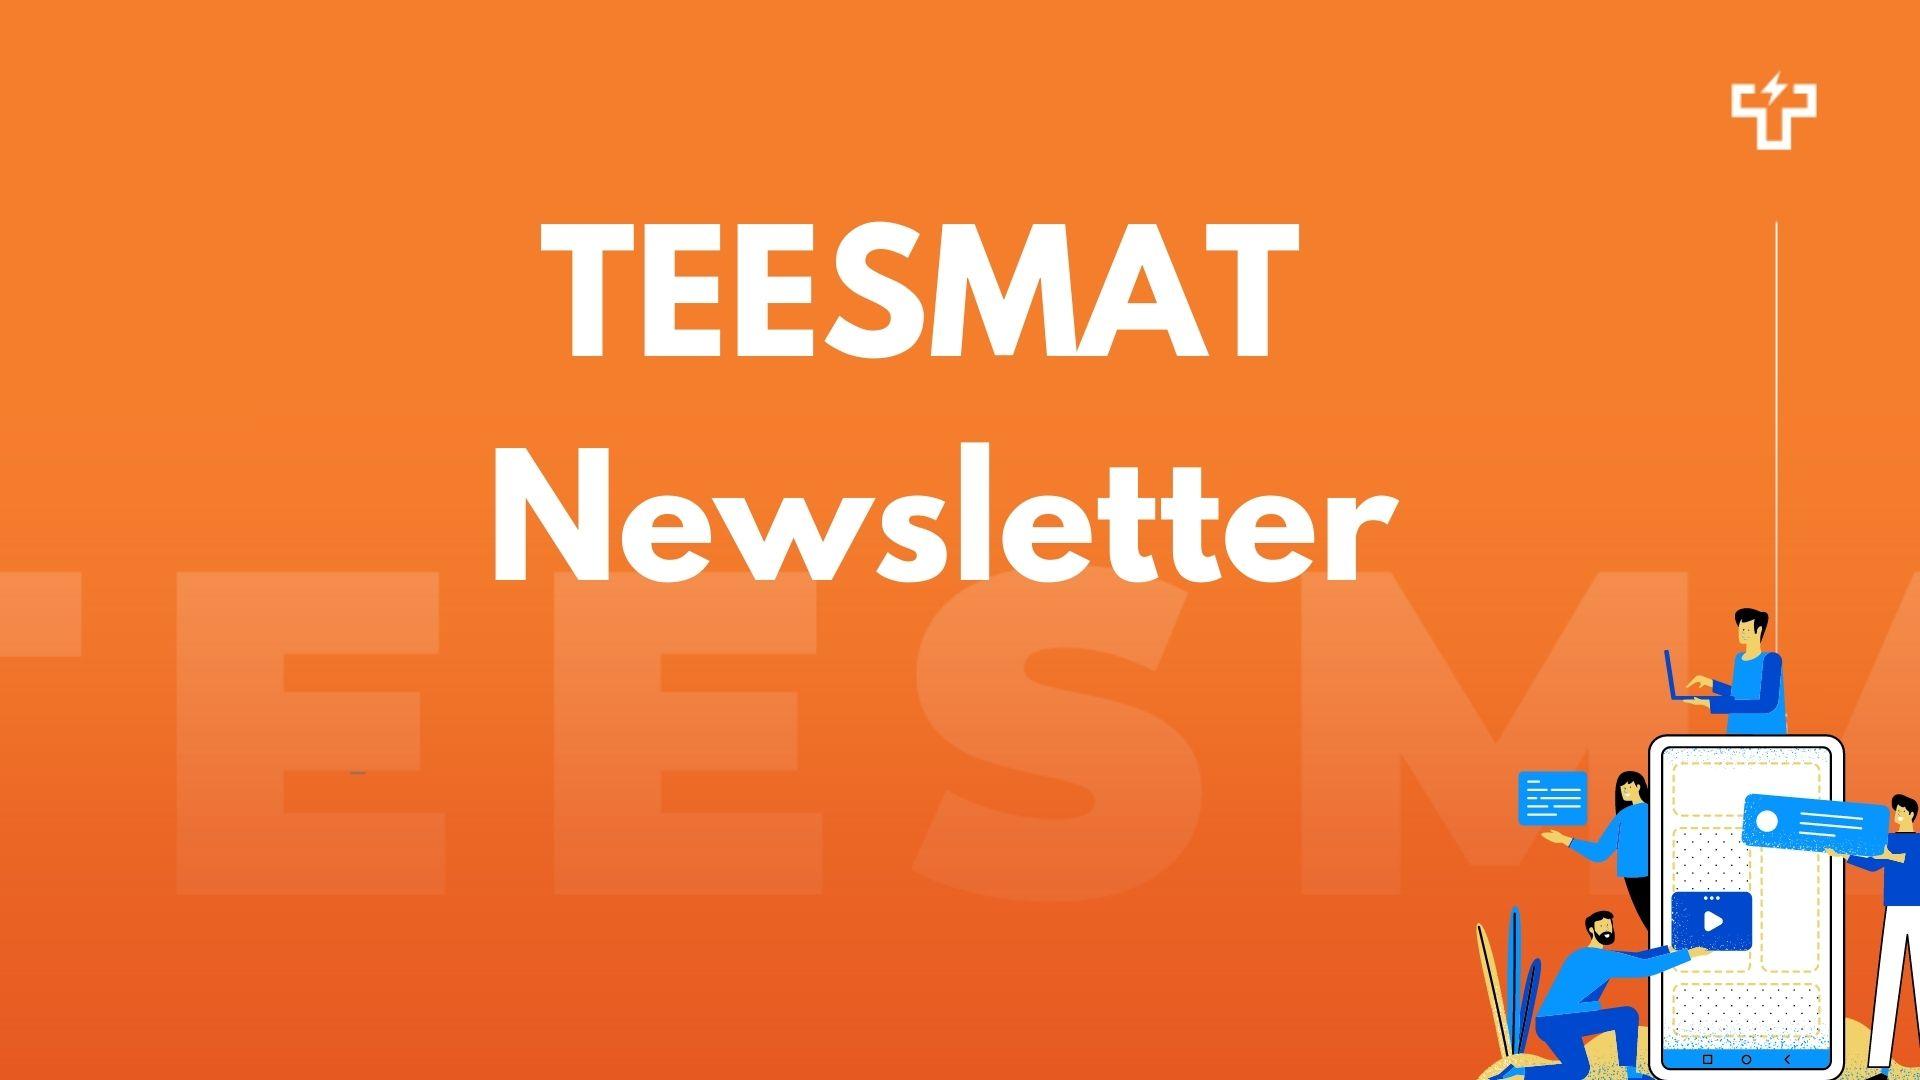 TEESMAT Newsletter